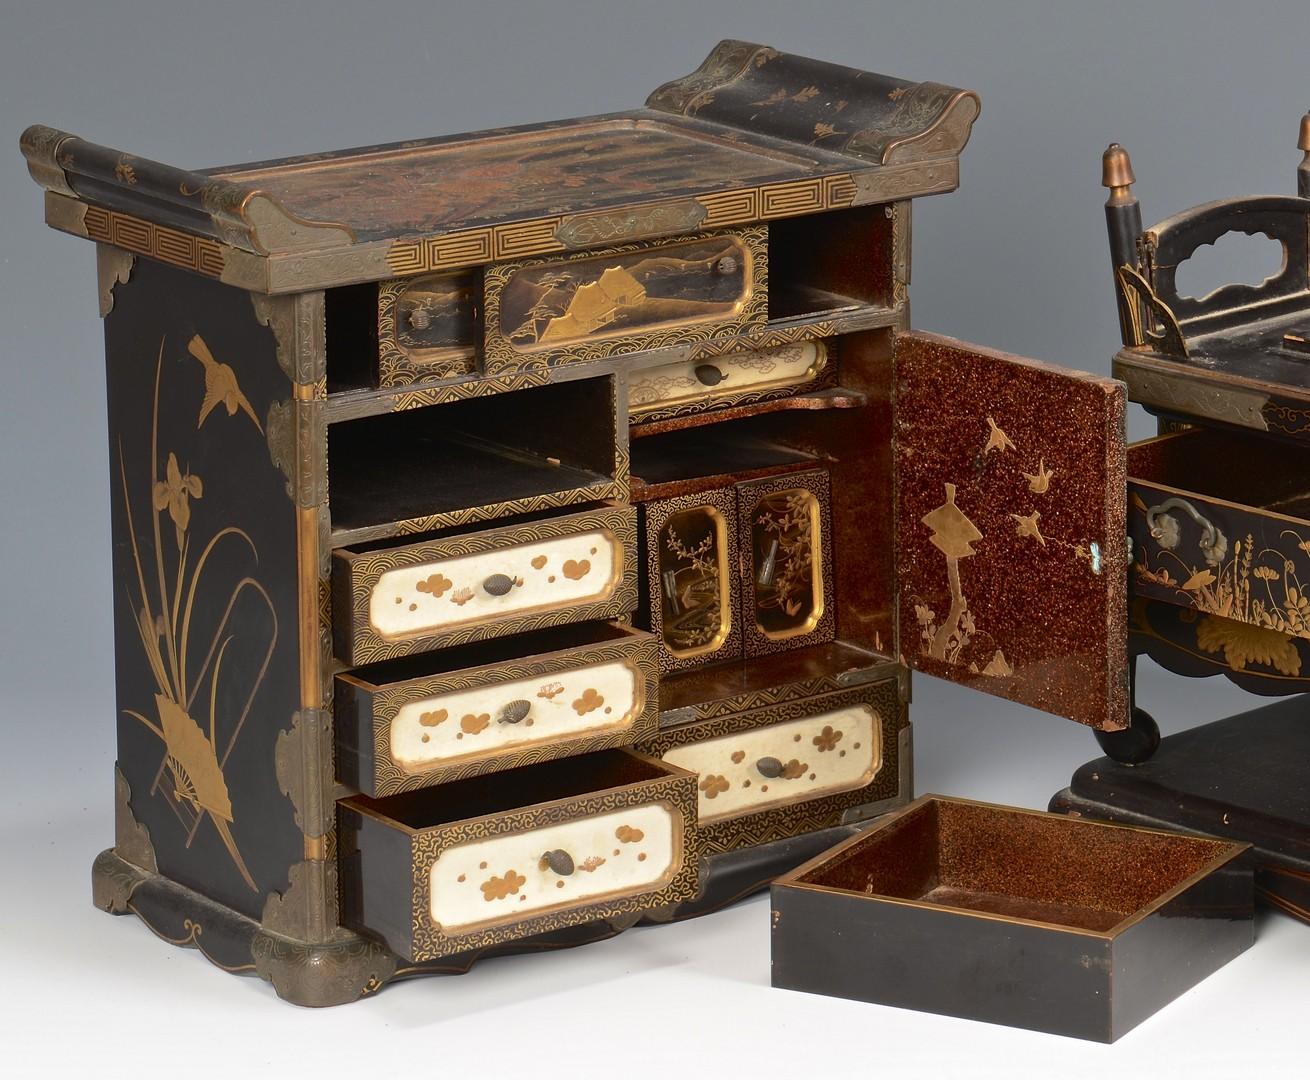 Lot 3832389: Japanese Takamaki-e Miniature Cabinet